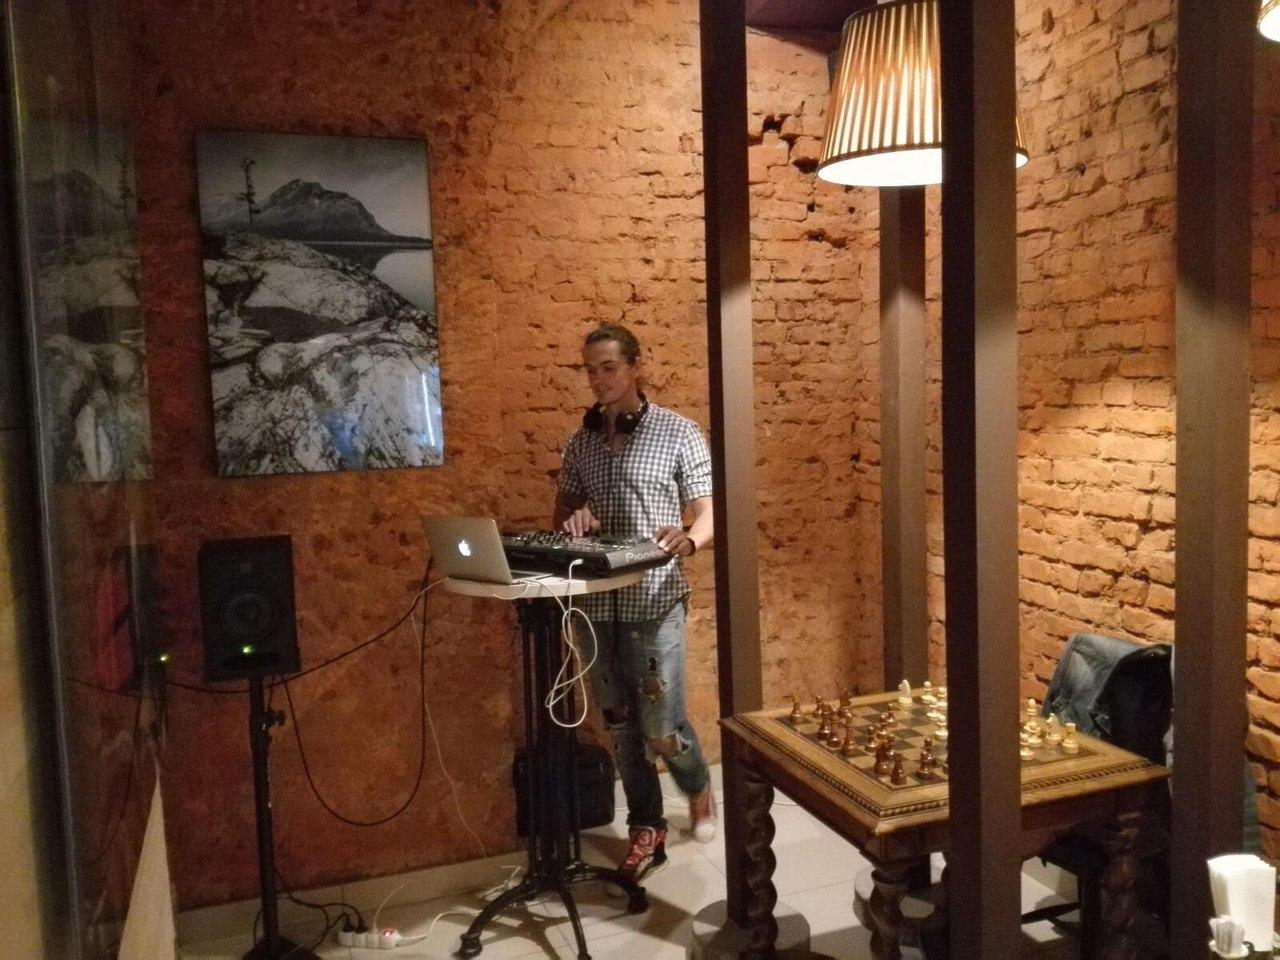 Строганина Бар Экспедиция на Китай-Городе фото 7